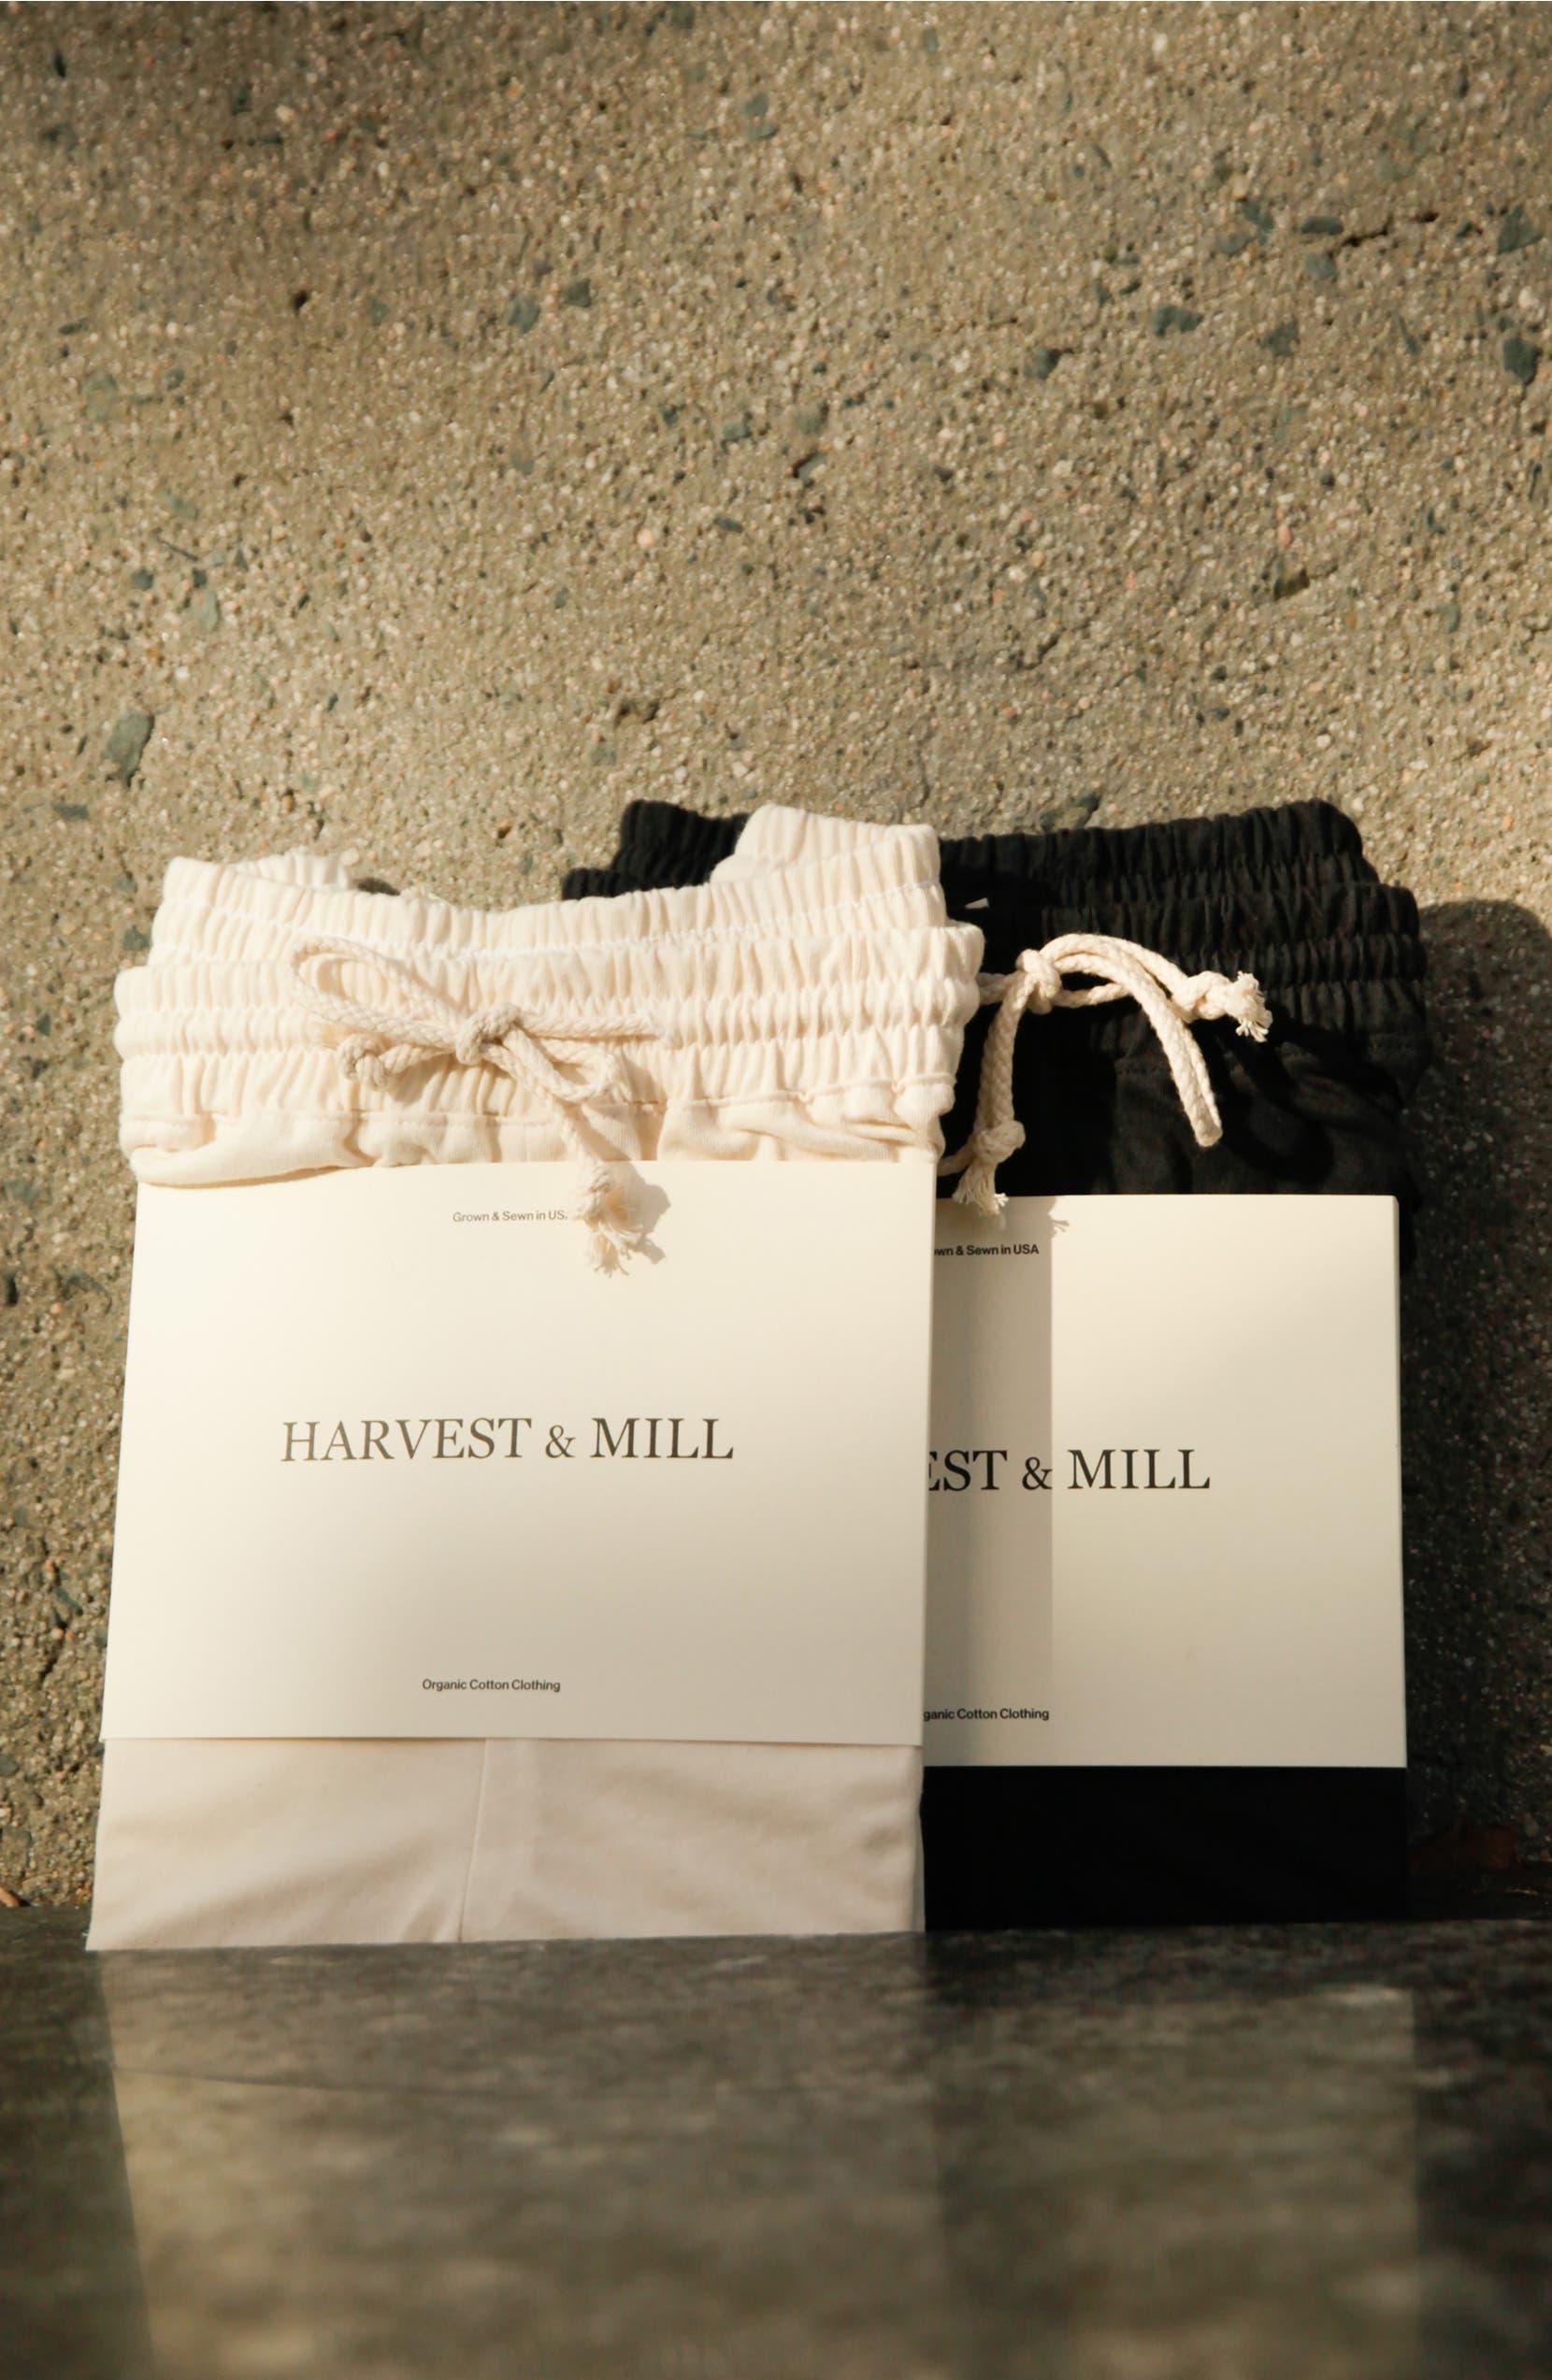 Harvest & Mill Organic Cotton Drawstring Pants